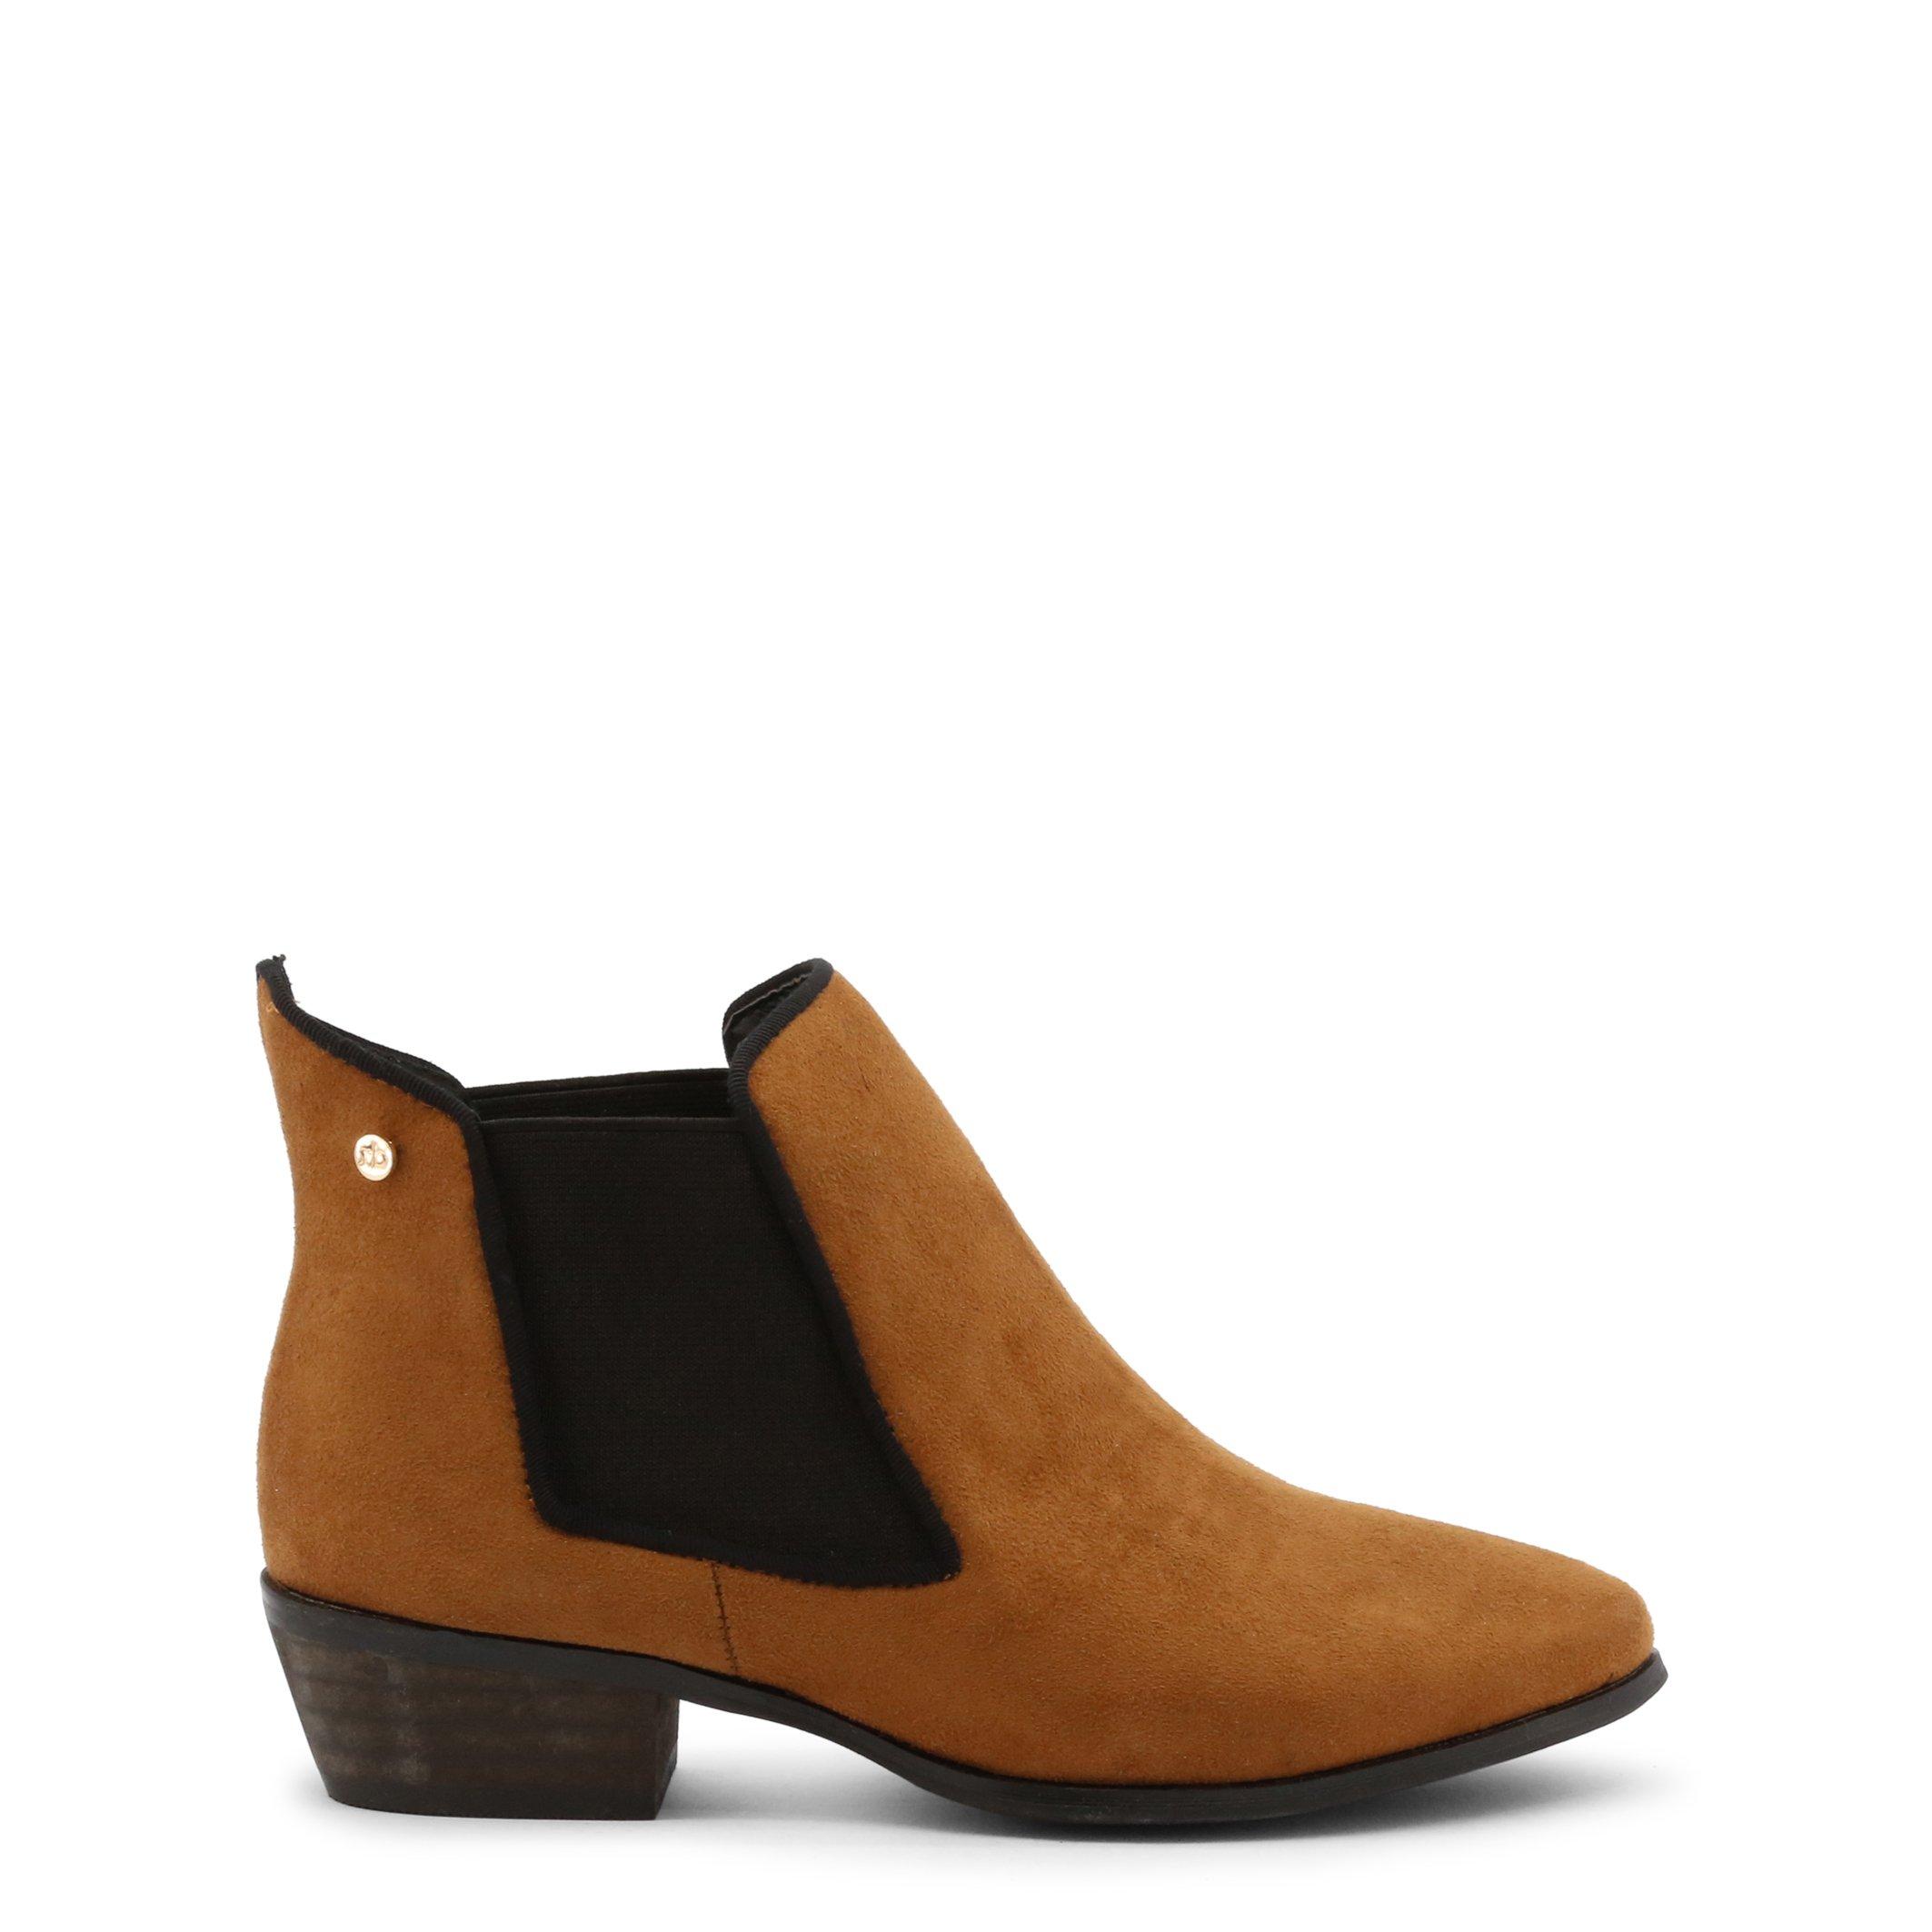 Roccobarocco Women's Ankle Boot Black RBSC1JJ02STD - brown EU 37